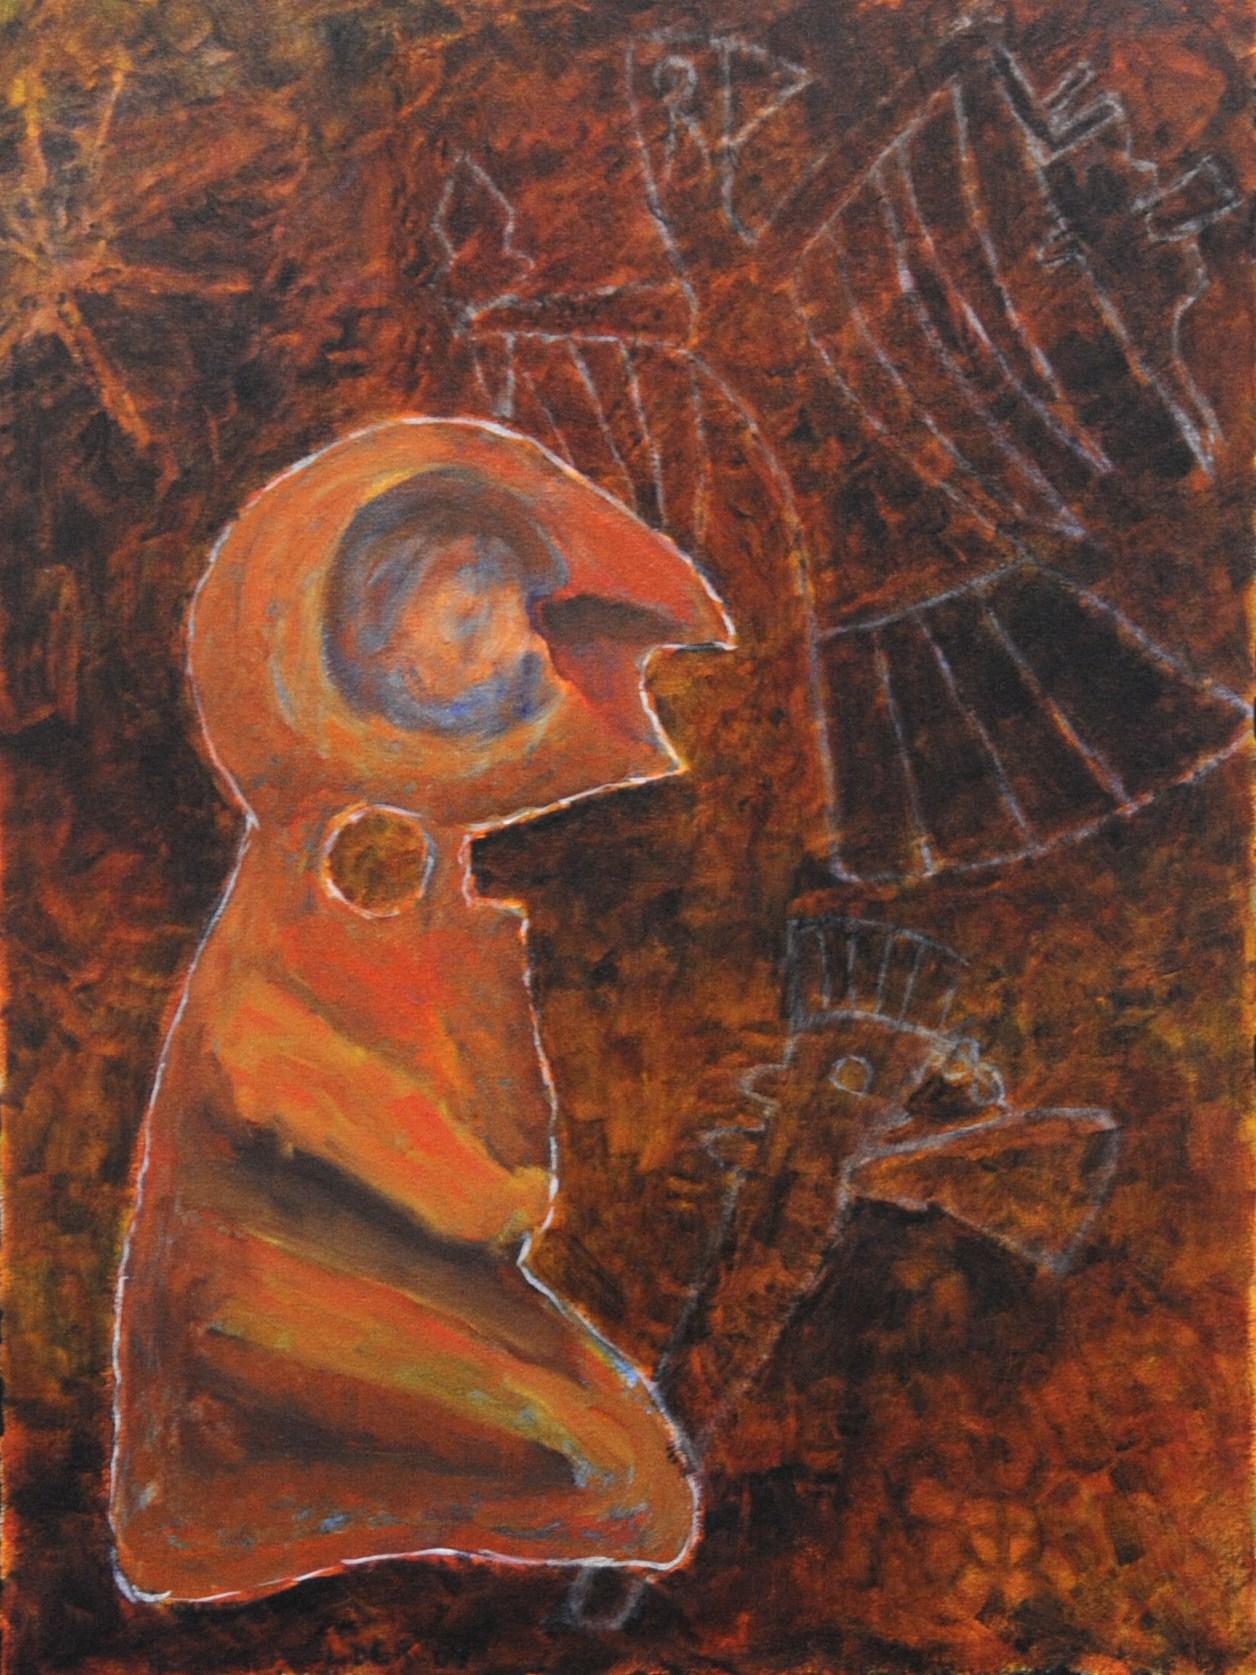 Bird-man artifact